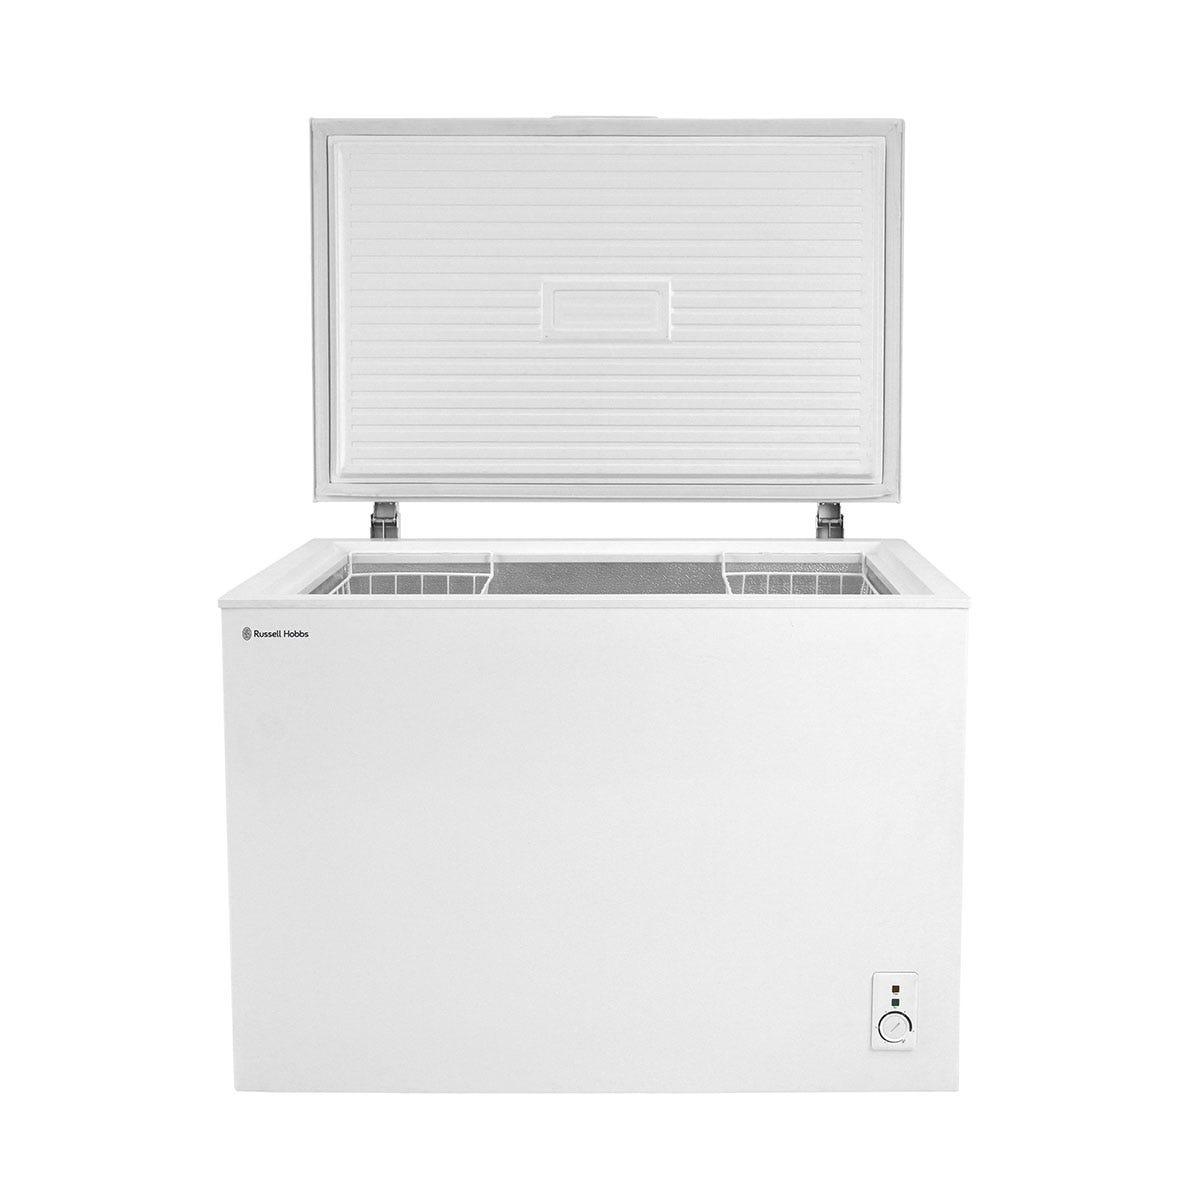 Russell Hobbs RHCF300 293L Chest Freezer - White